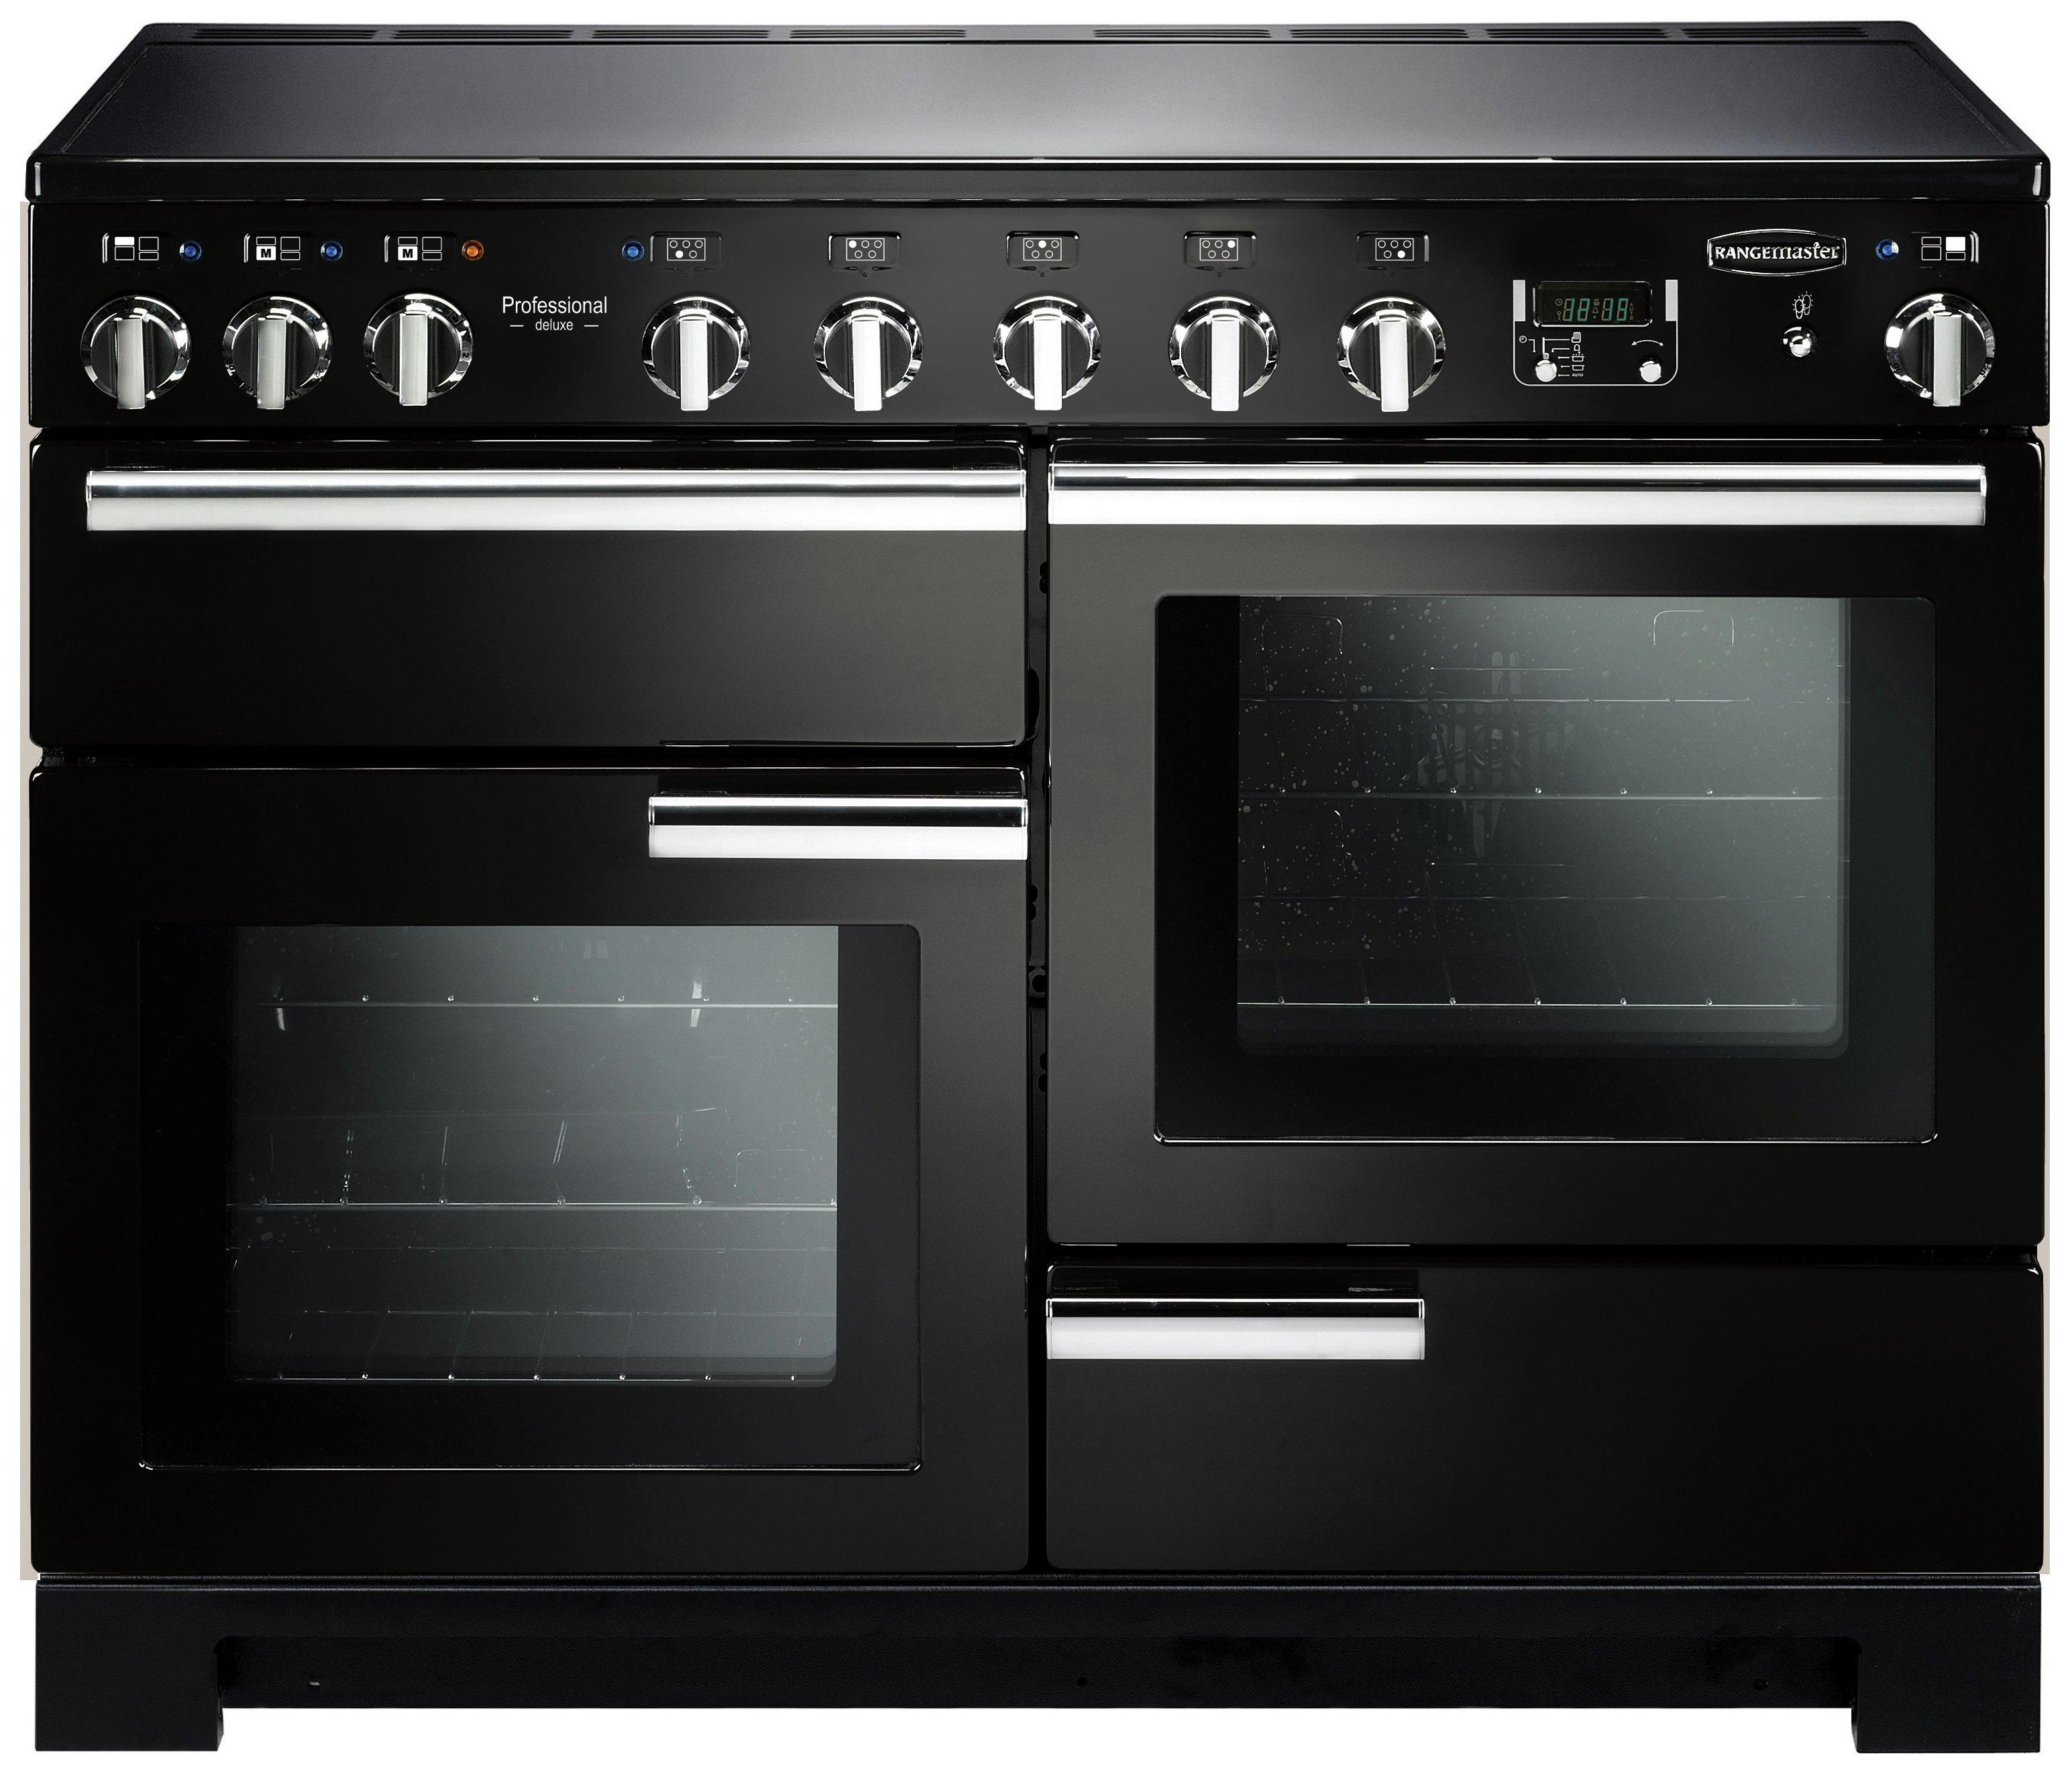 Image of Rangemaster Professional Deluxe 110cm Range Cooker - Black